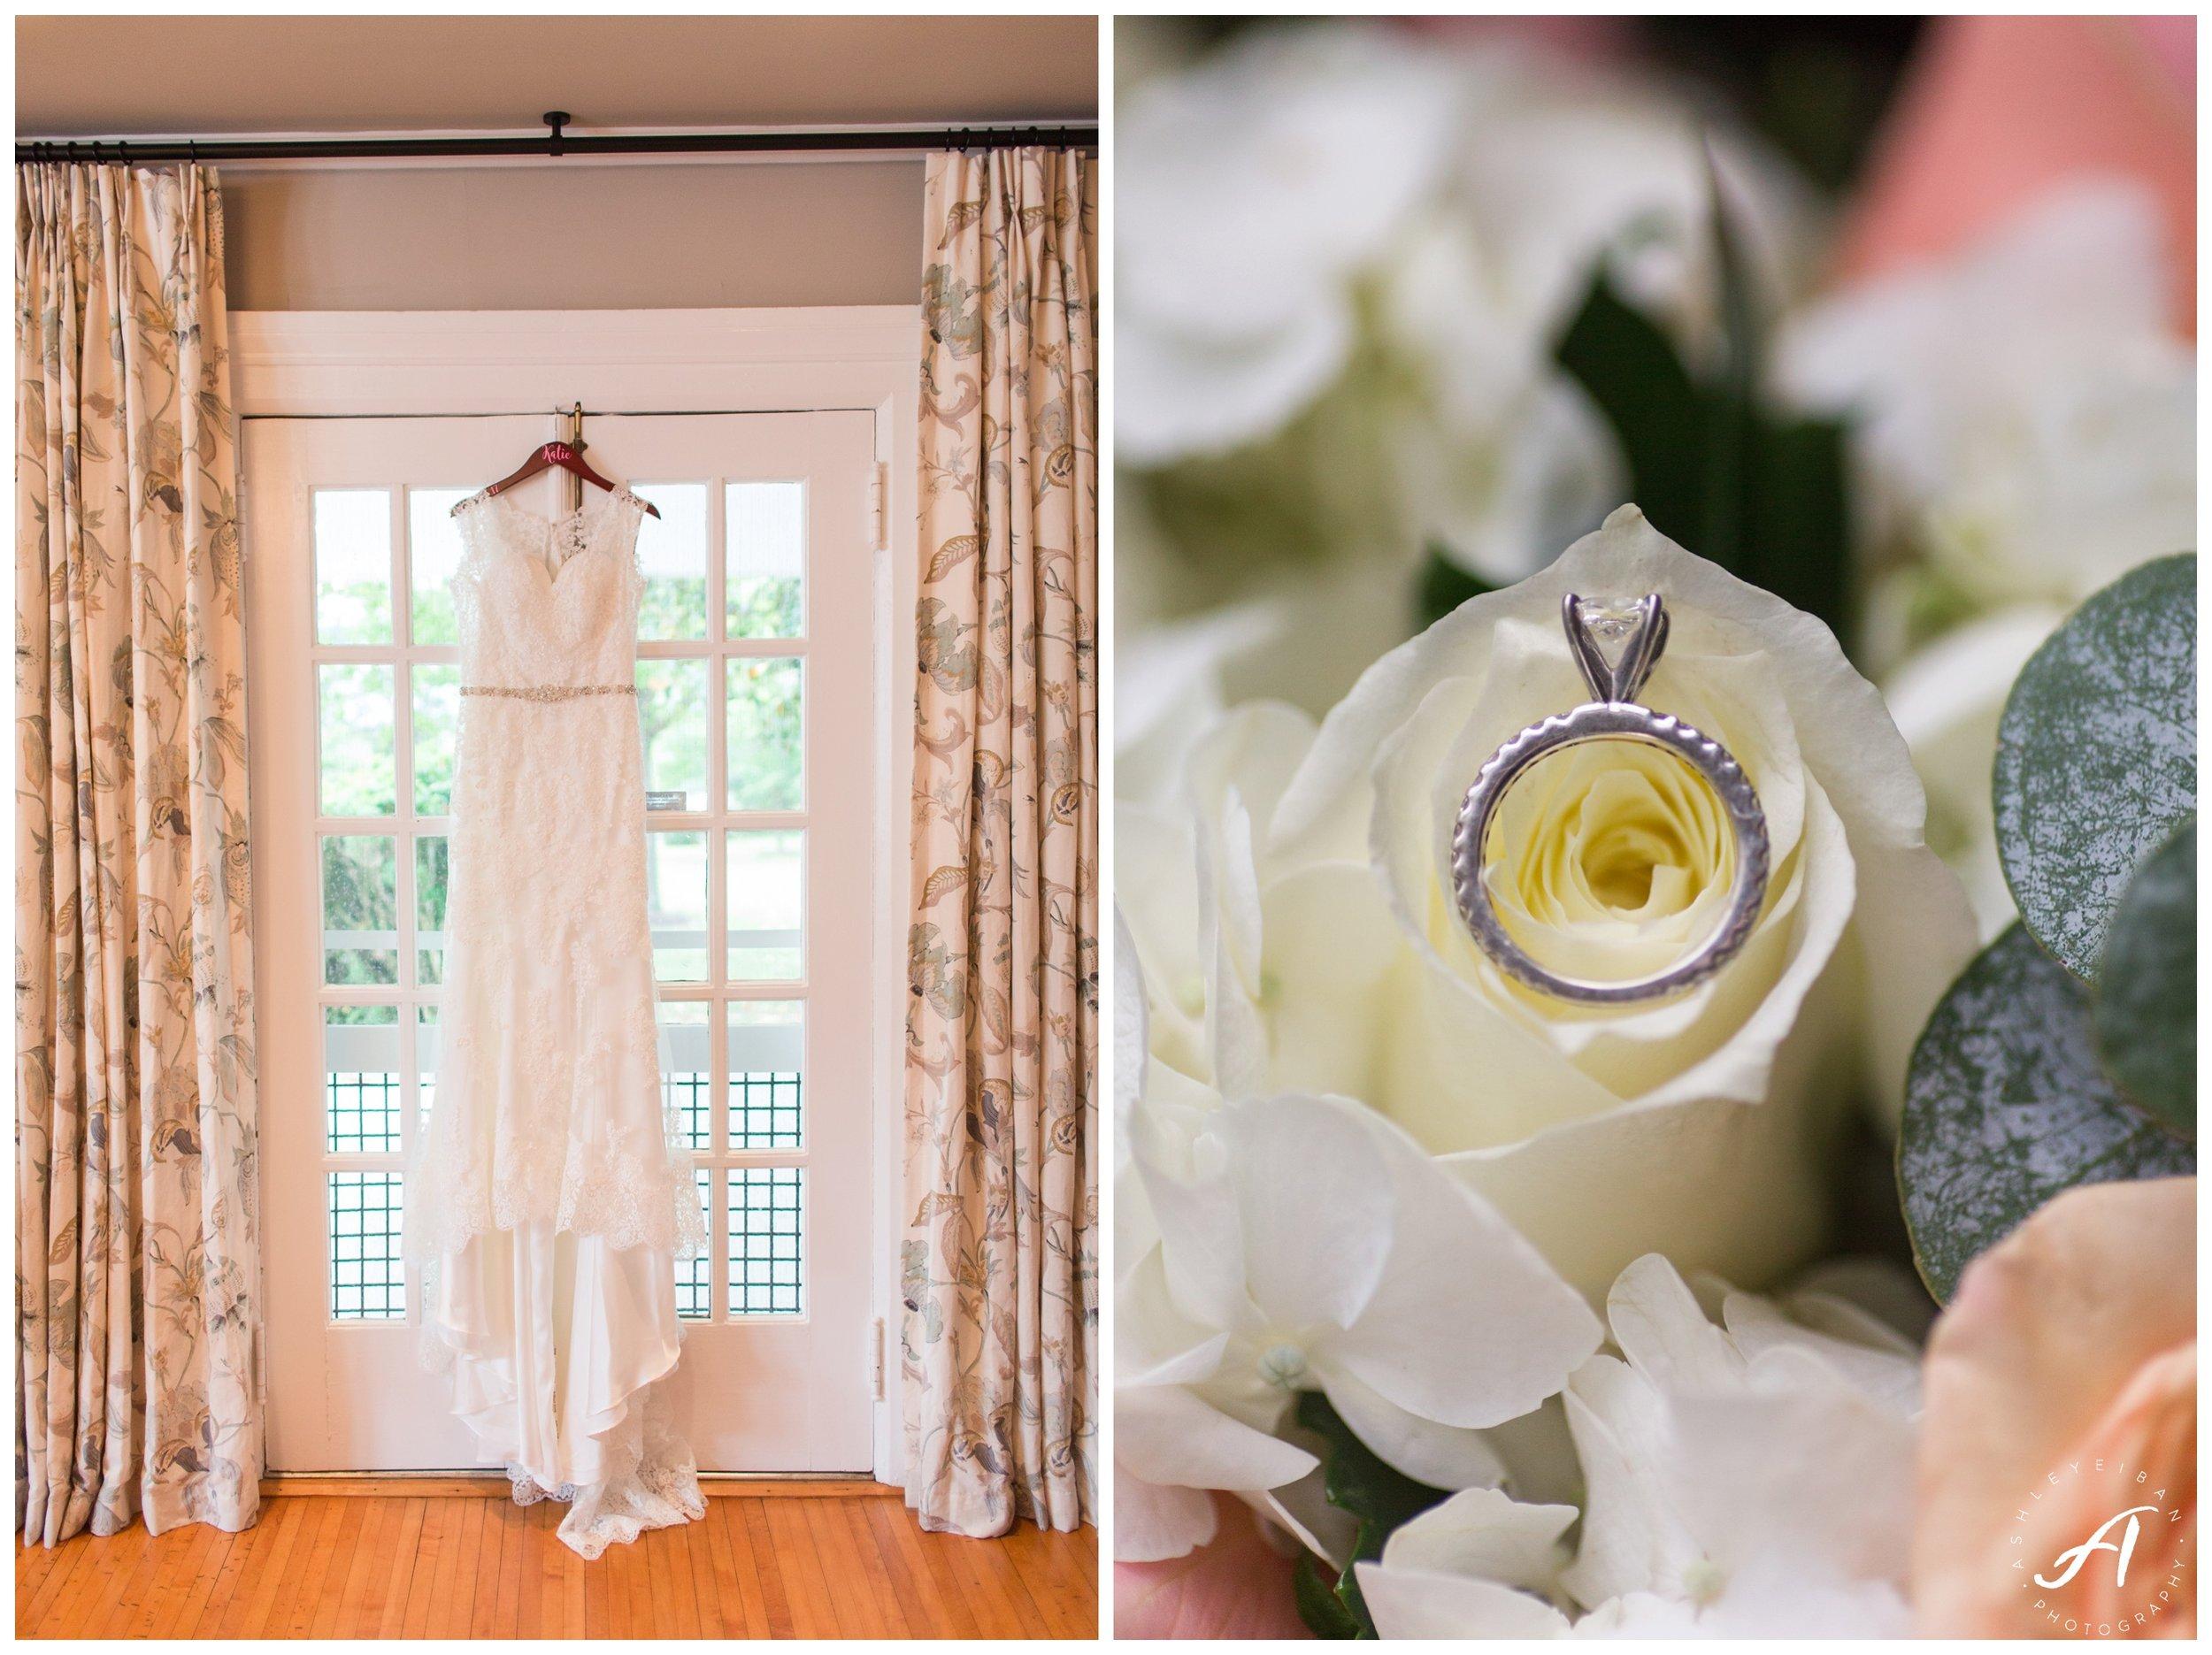 Spring Trivium Estate Wedding || blush and navy wedding || Ashley Eiban Photography || www.ashleyeiban.com